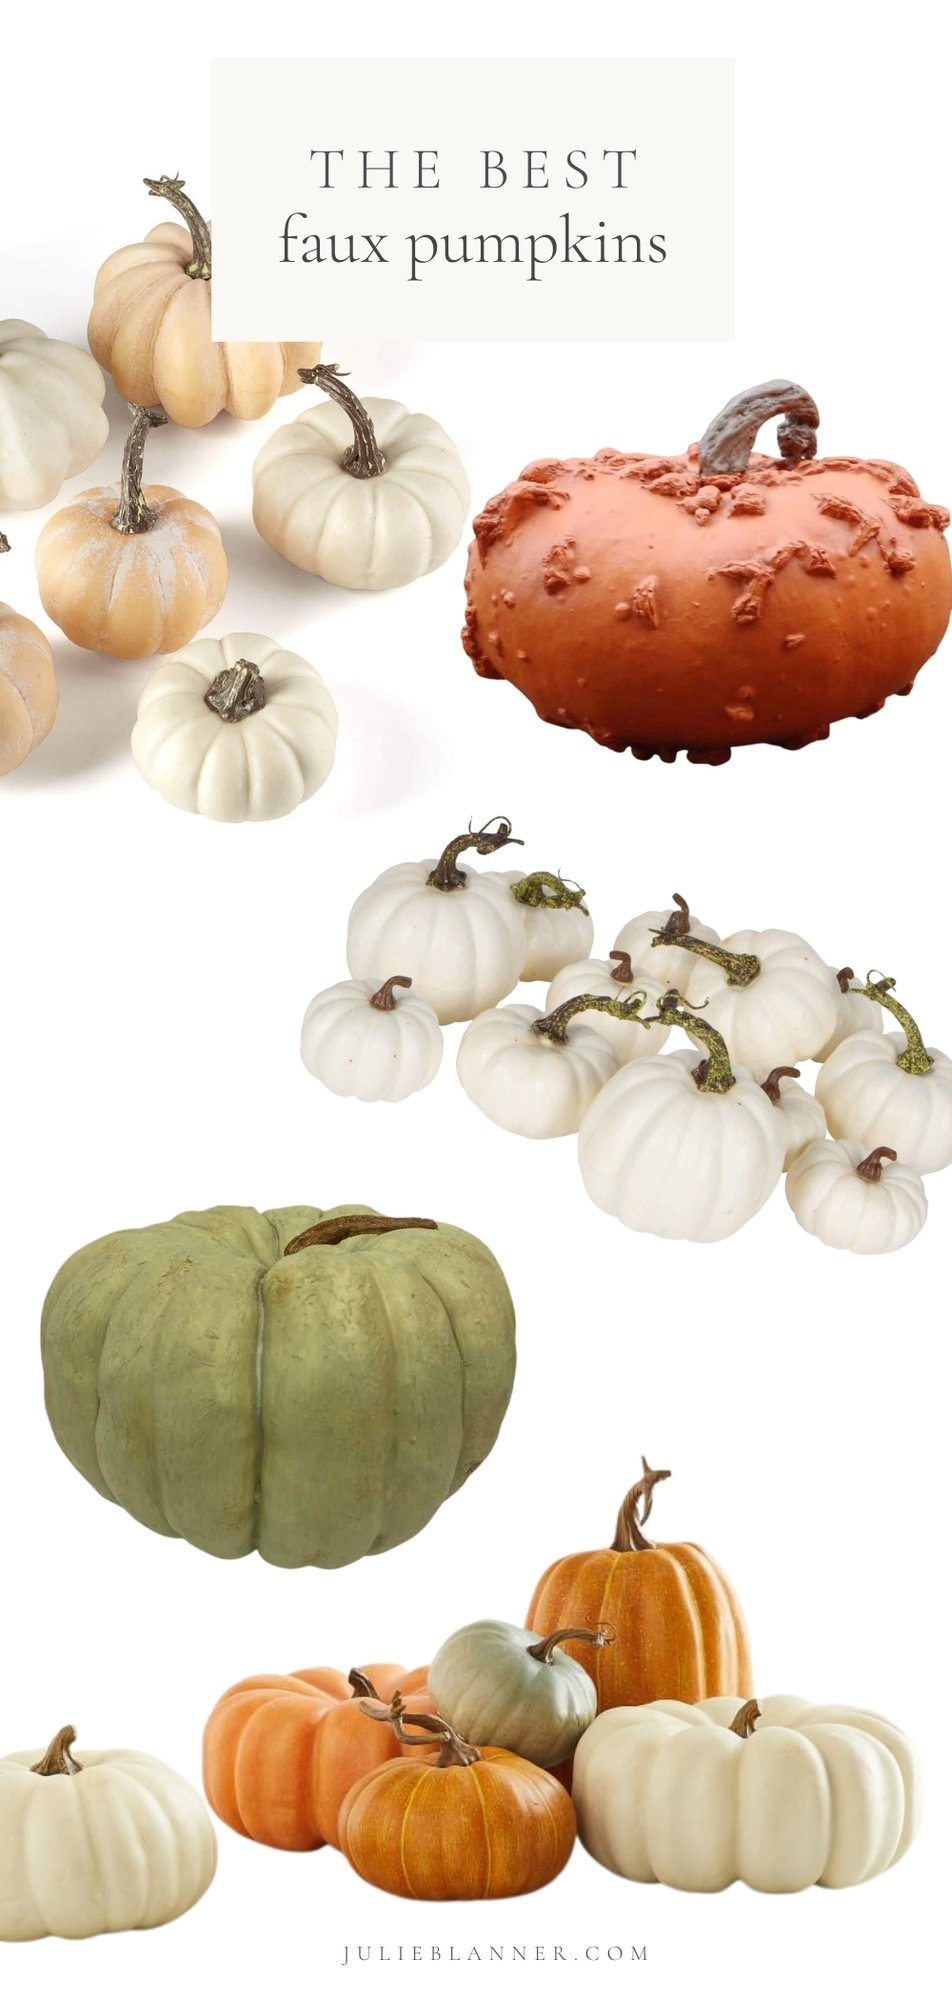 graphic of faux pumpkins